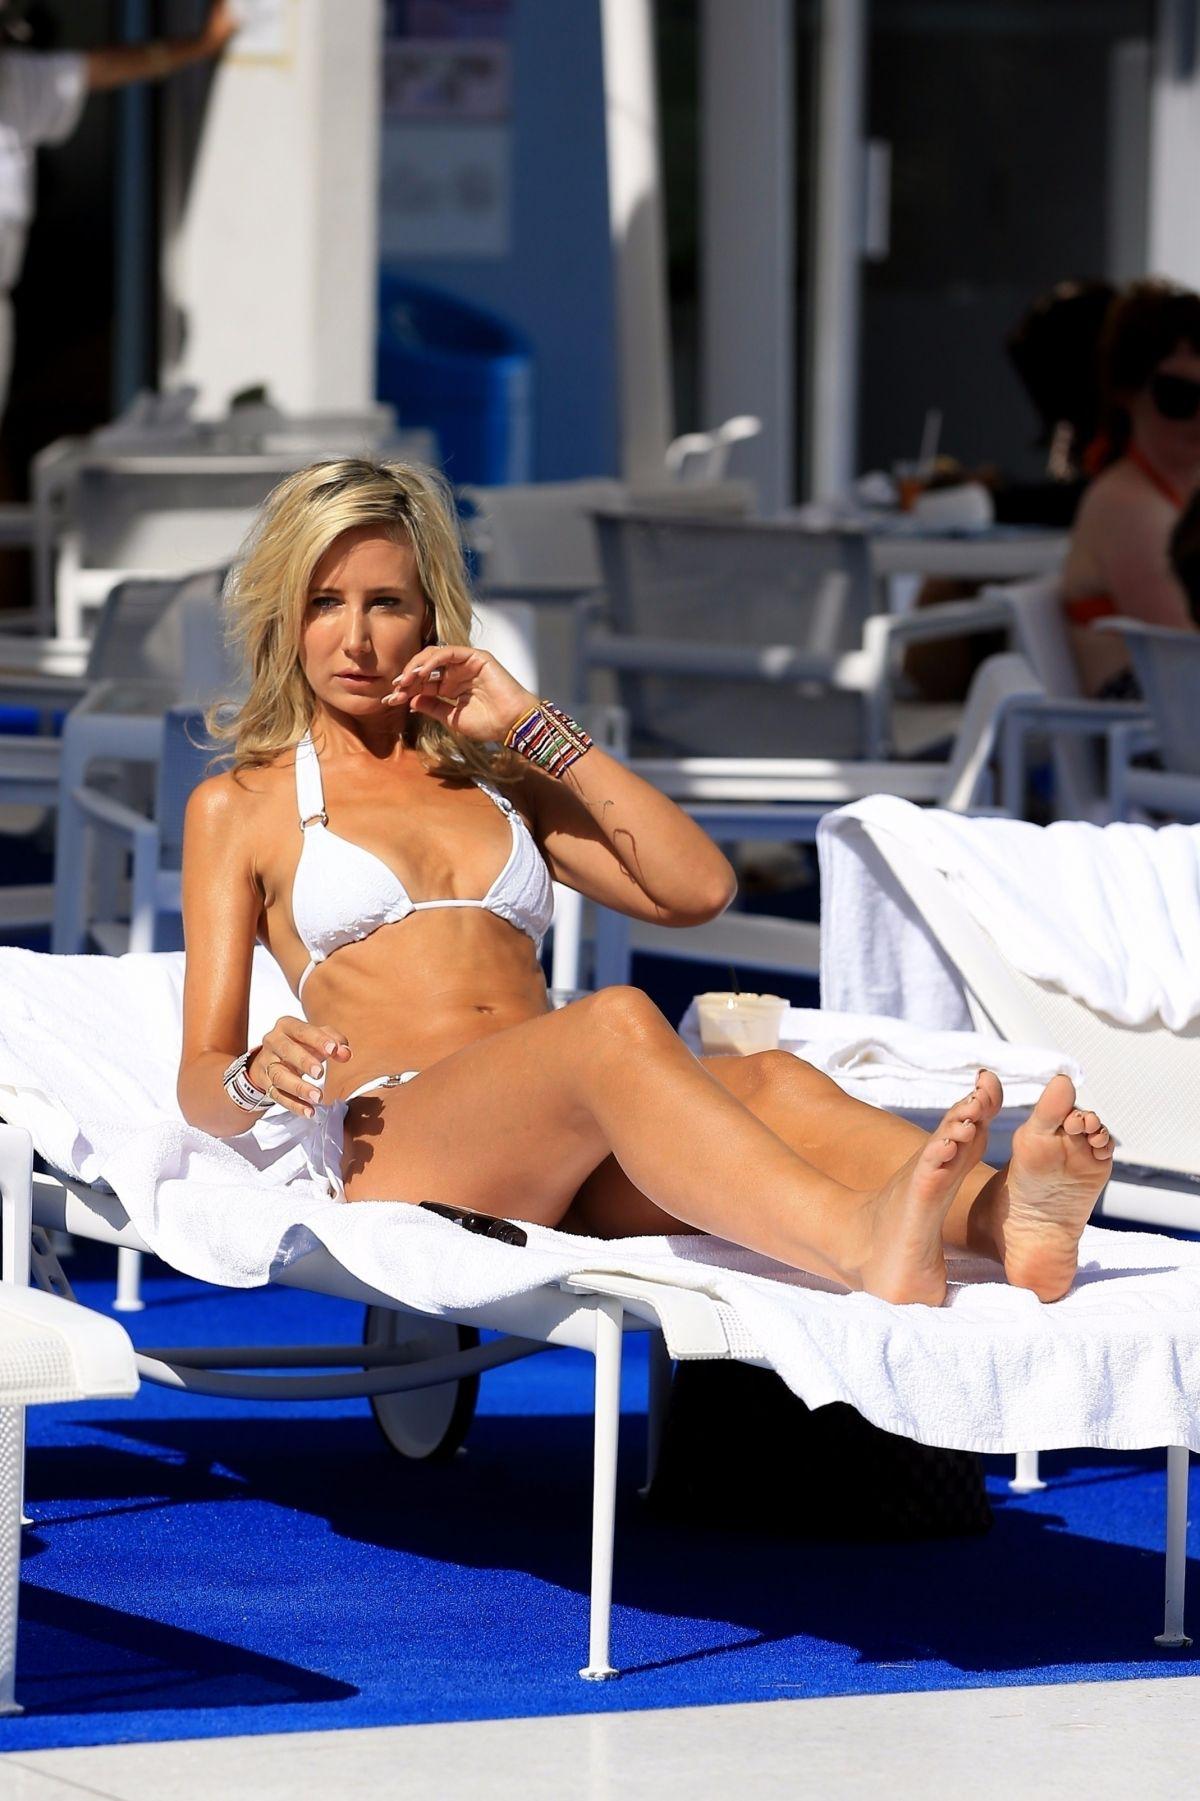 bikini 2017 hollywood - photo #28